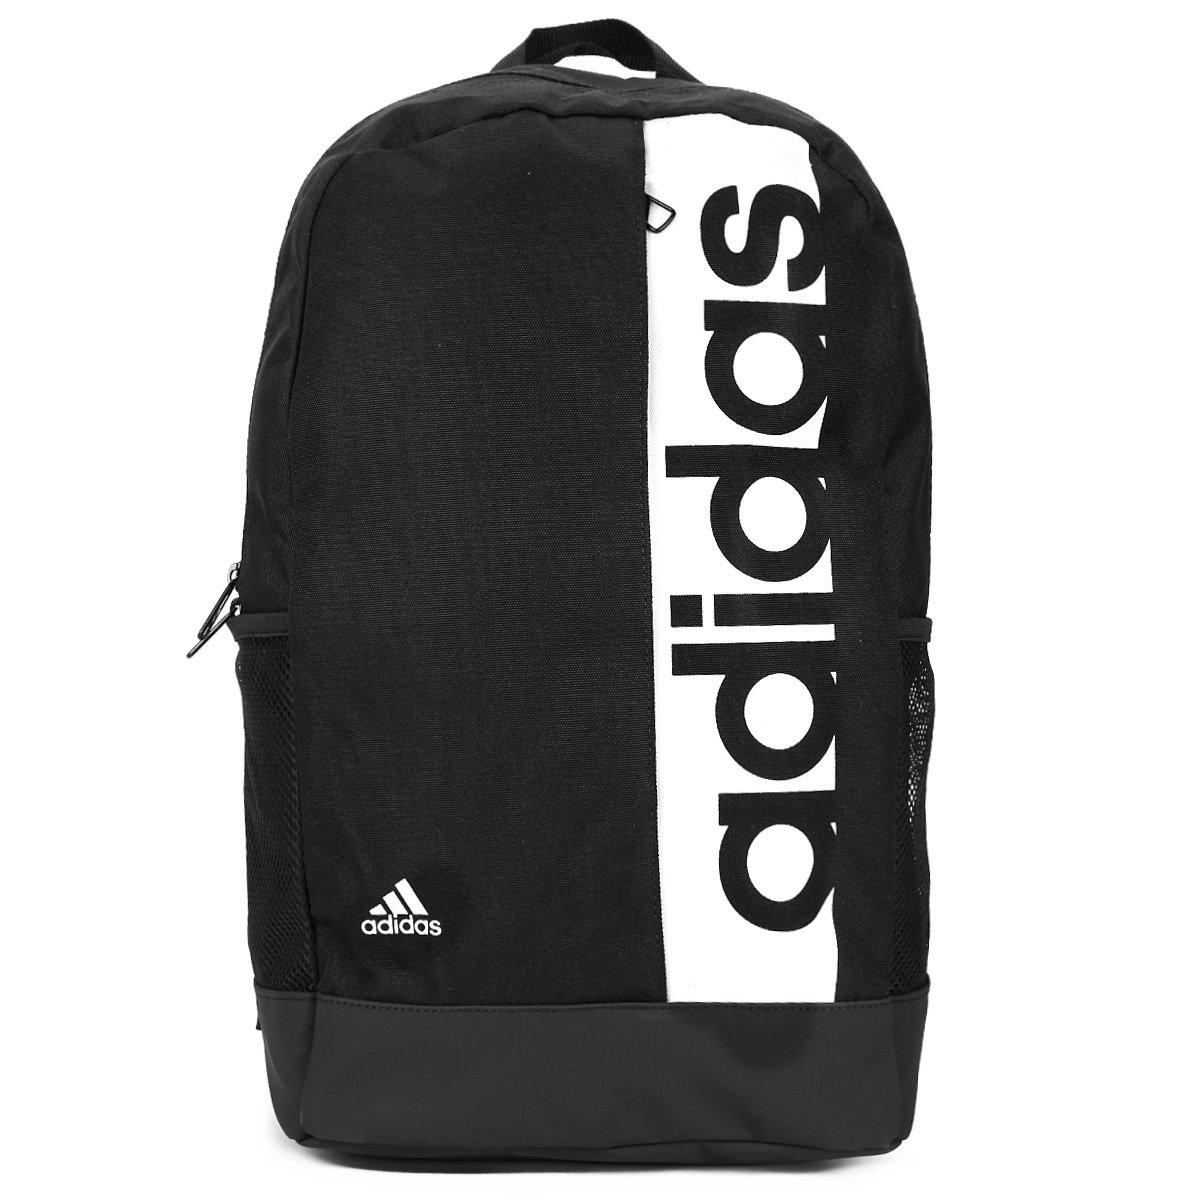 Mochila Adidas Essential Linear Masculina - Compre Agora  7e5a85f1f3da4